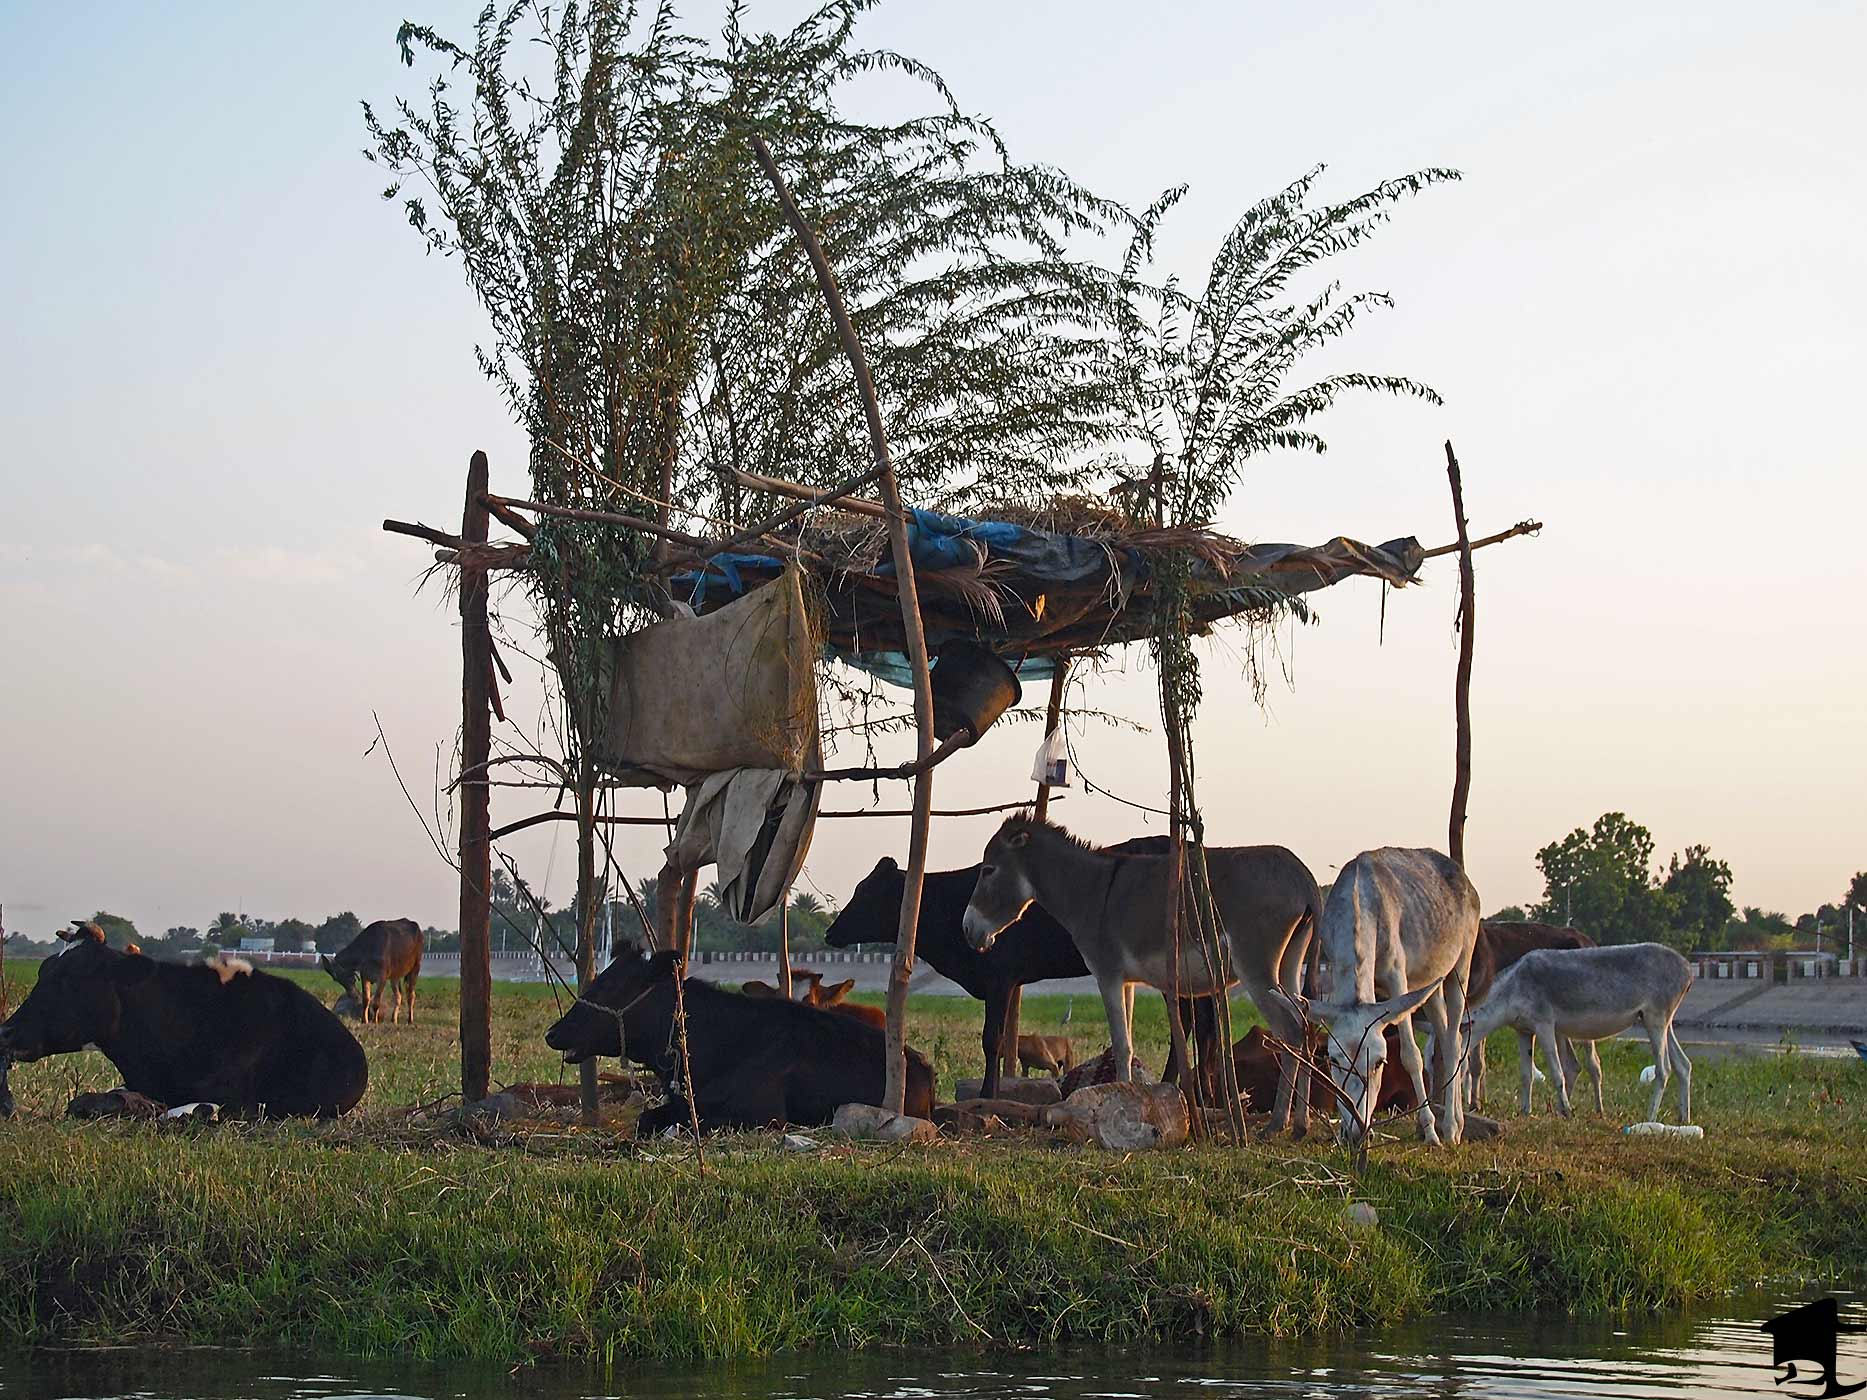 Animals along the Nile